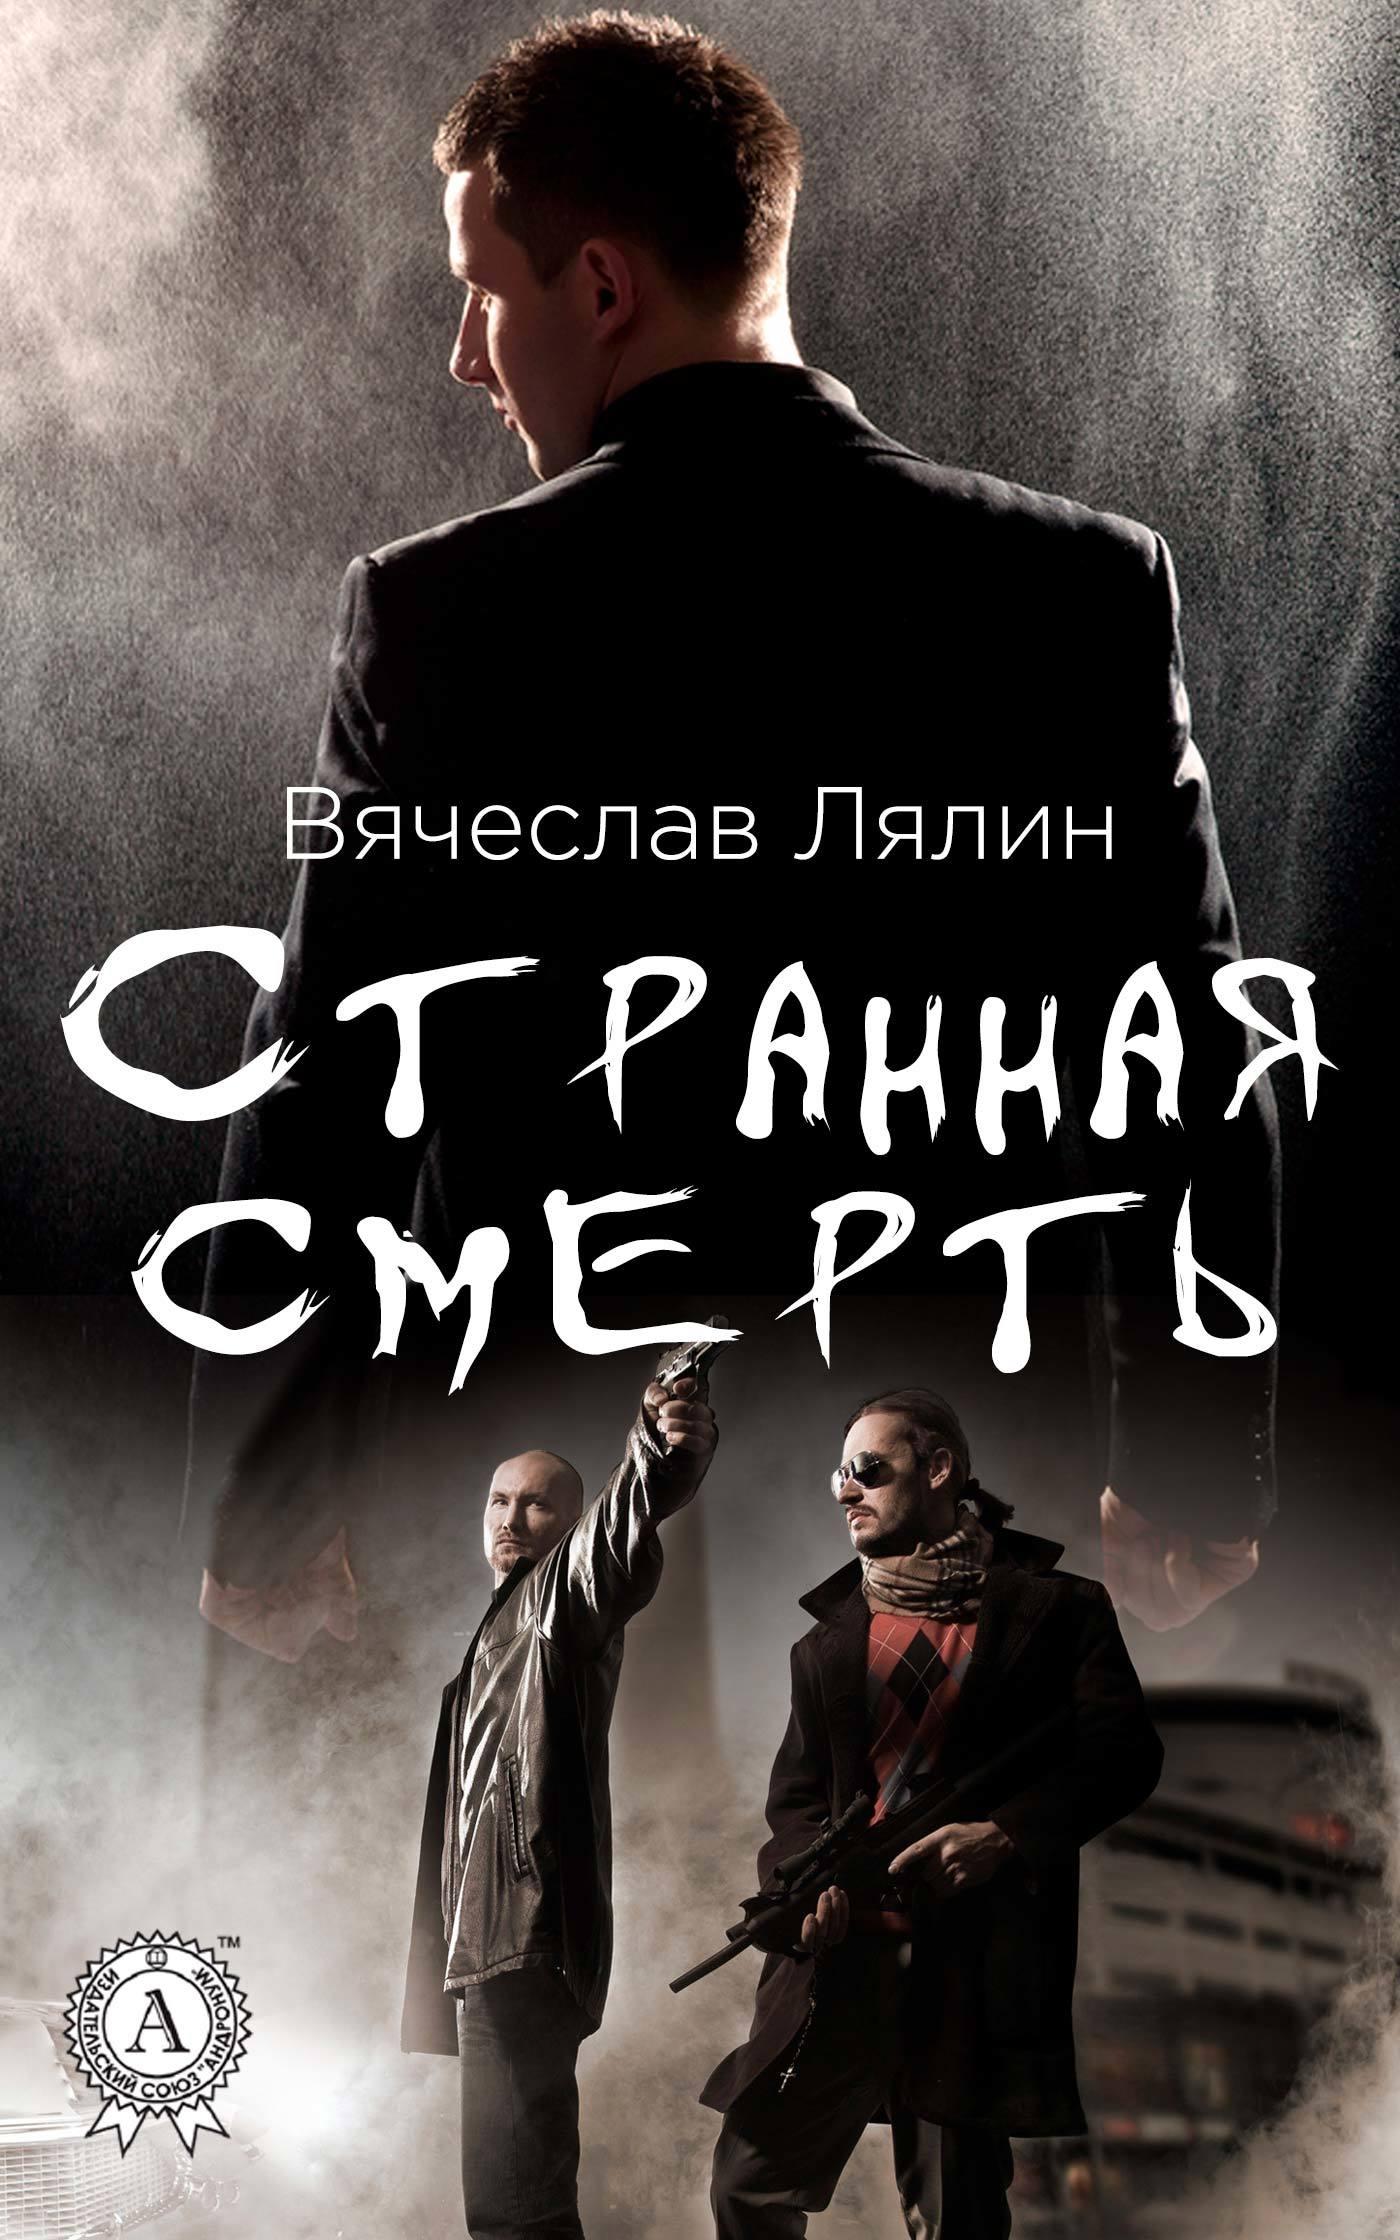 Вячеслав Лялин Странная смерть вячеслав лялин несостоявшееся убийство page 9